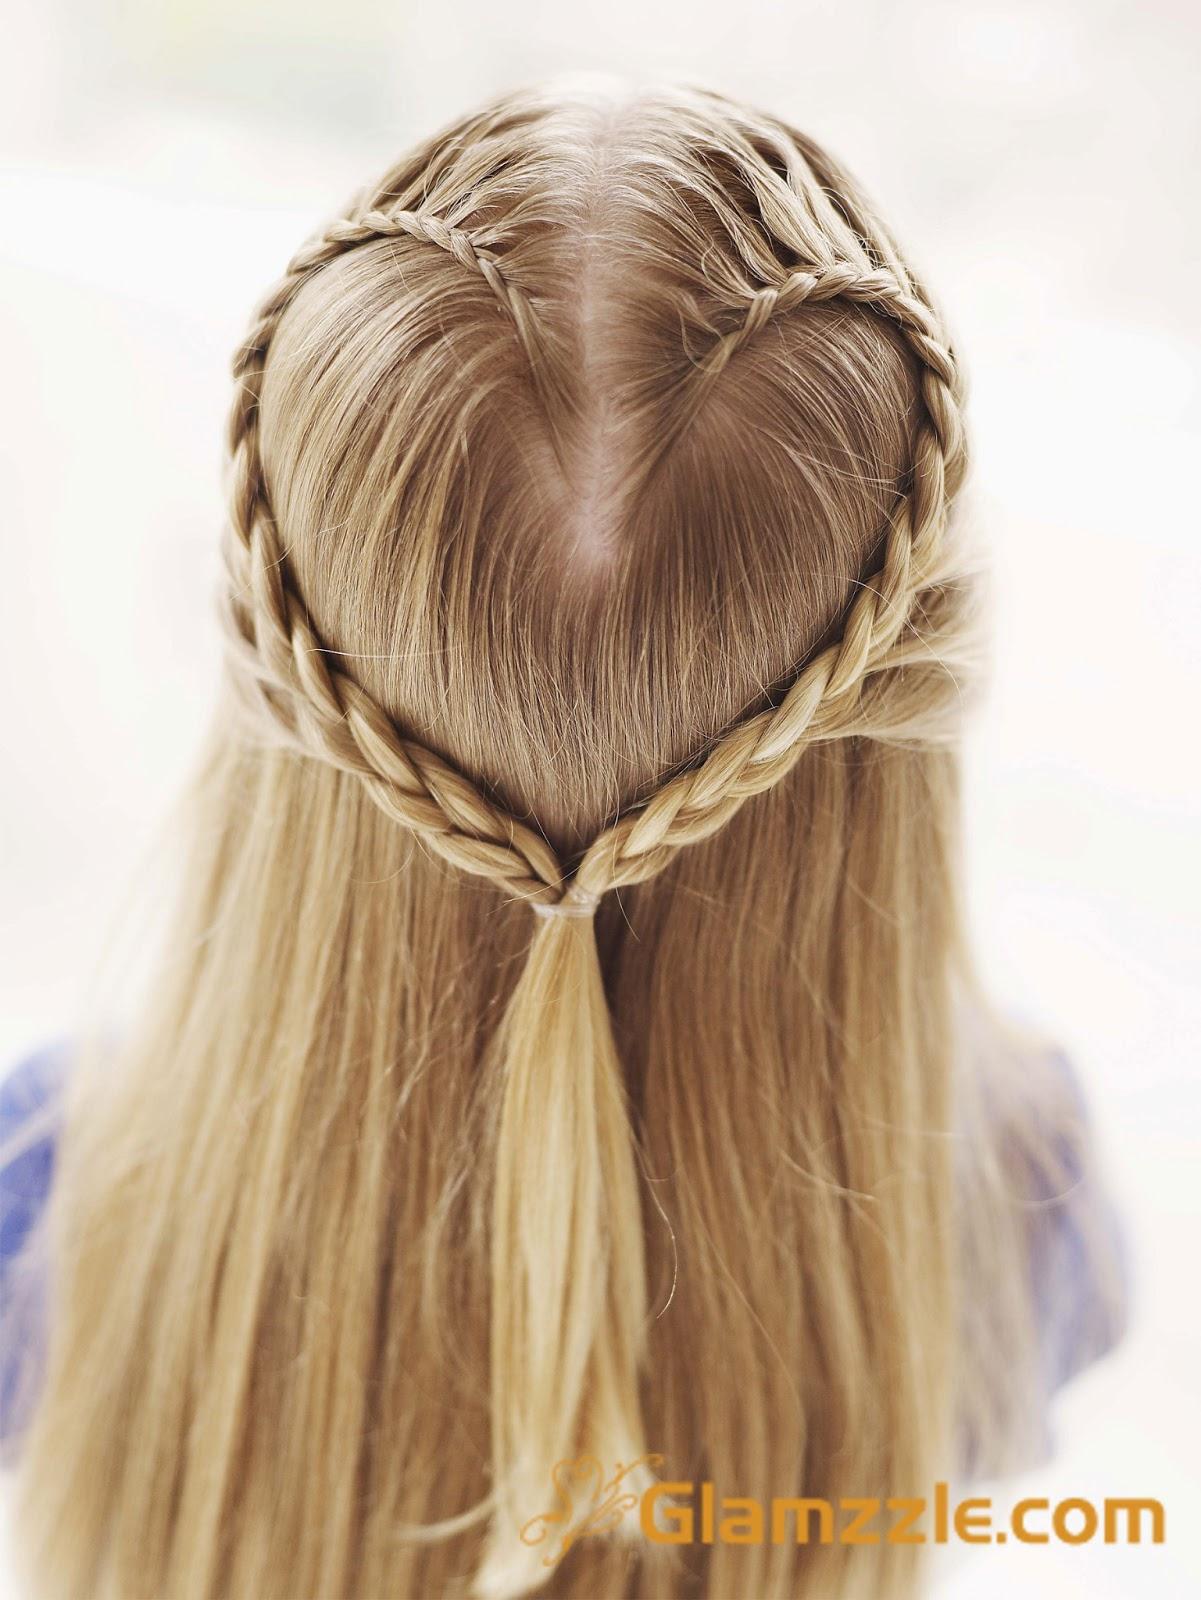 Histoire De La Mode - Gaya rambut pendek kepang